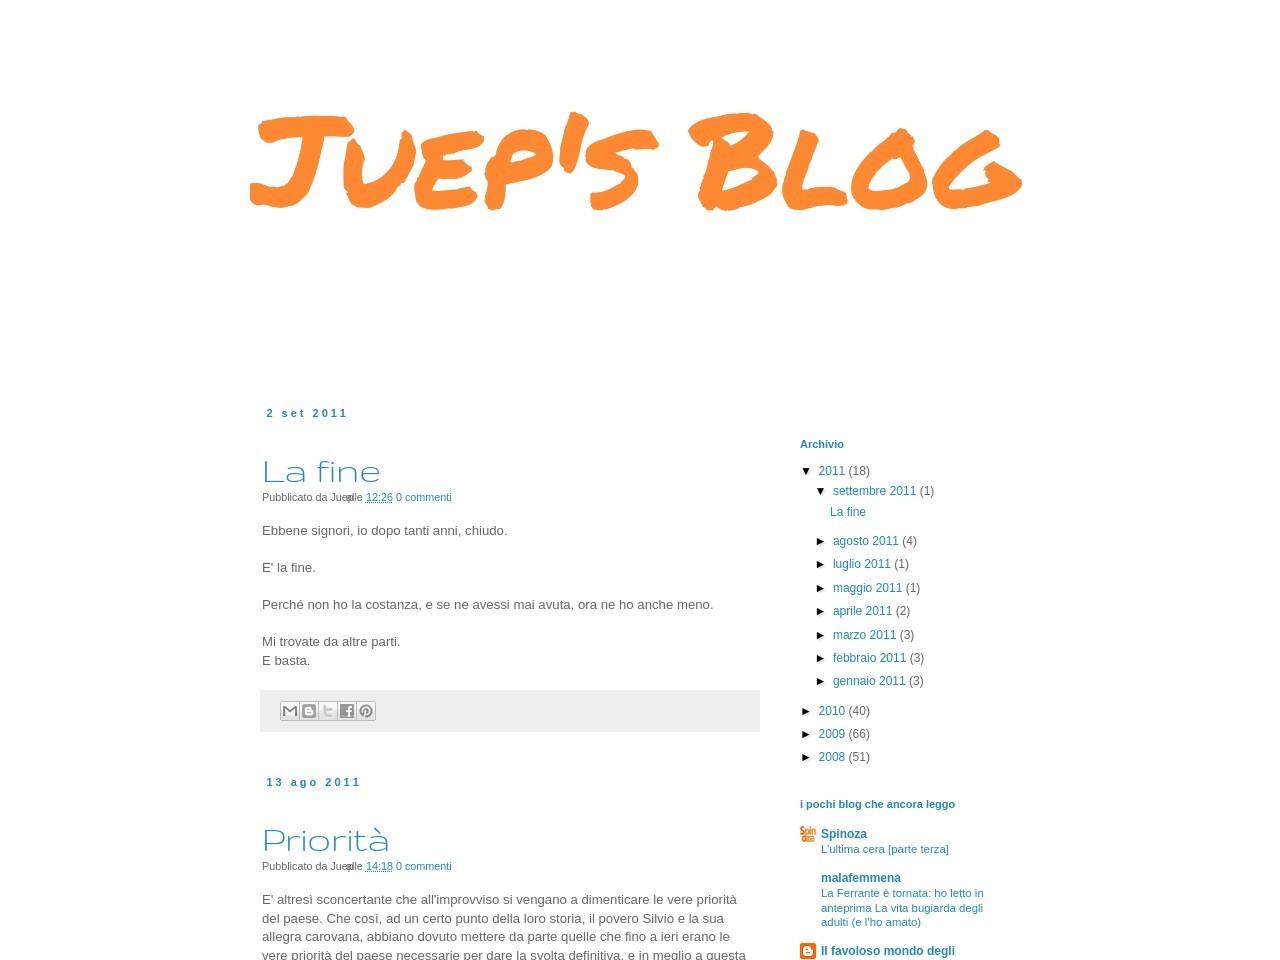 jueps-blog